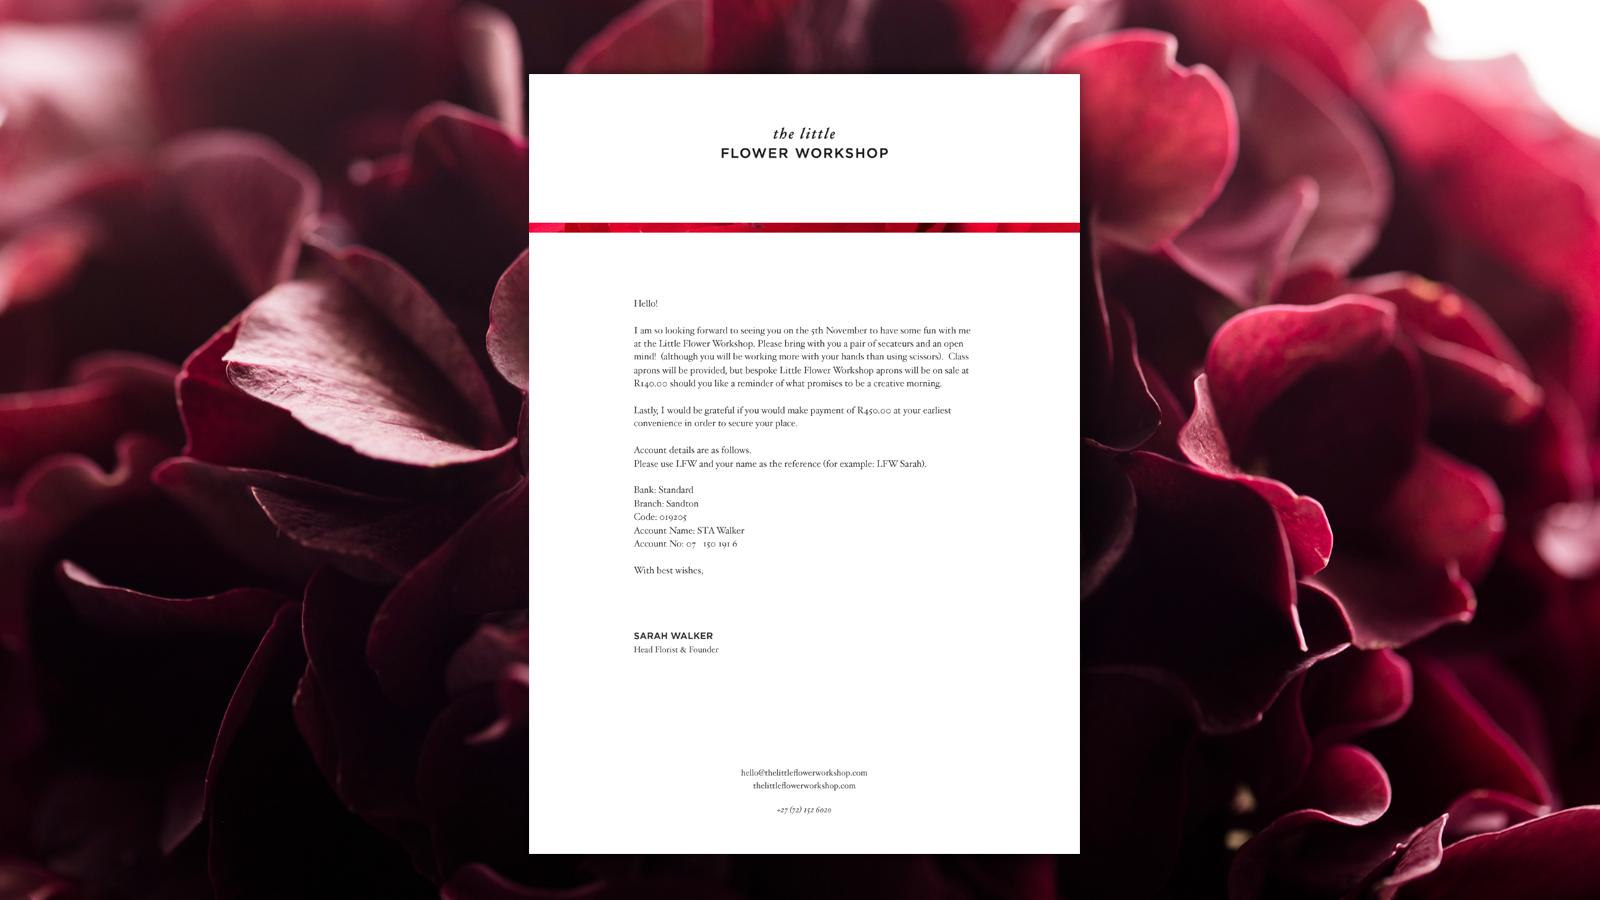 The-Little-Flower-Workshop-Letterhead-Designed-By-ALSO-Agency